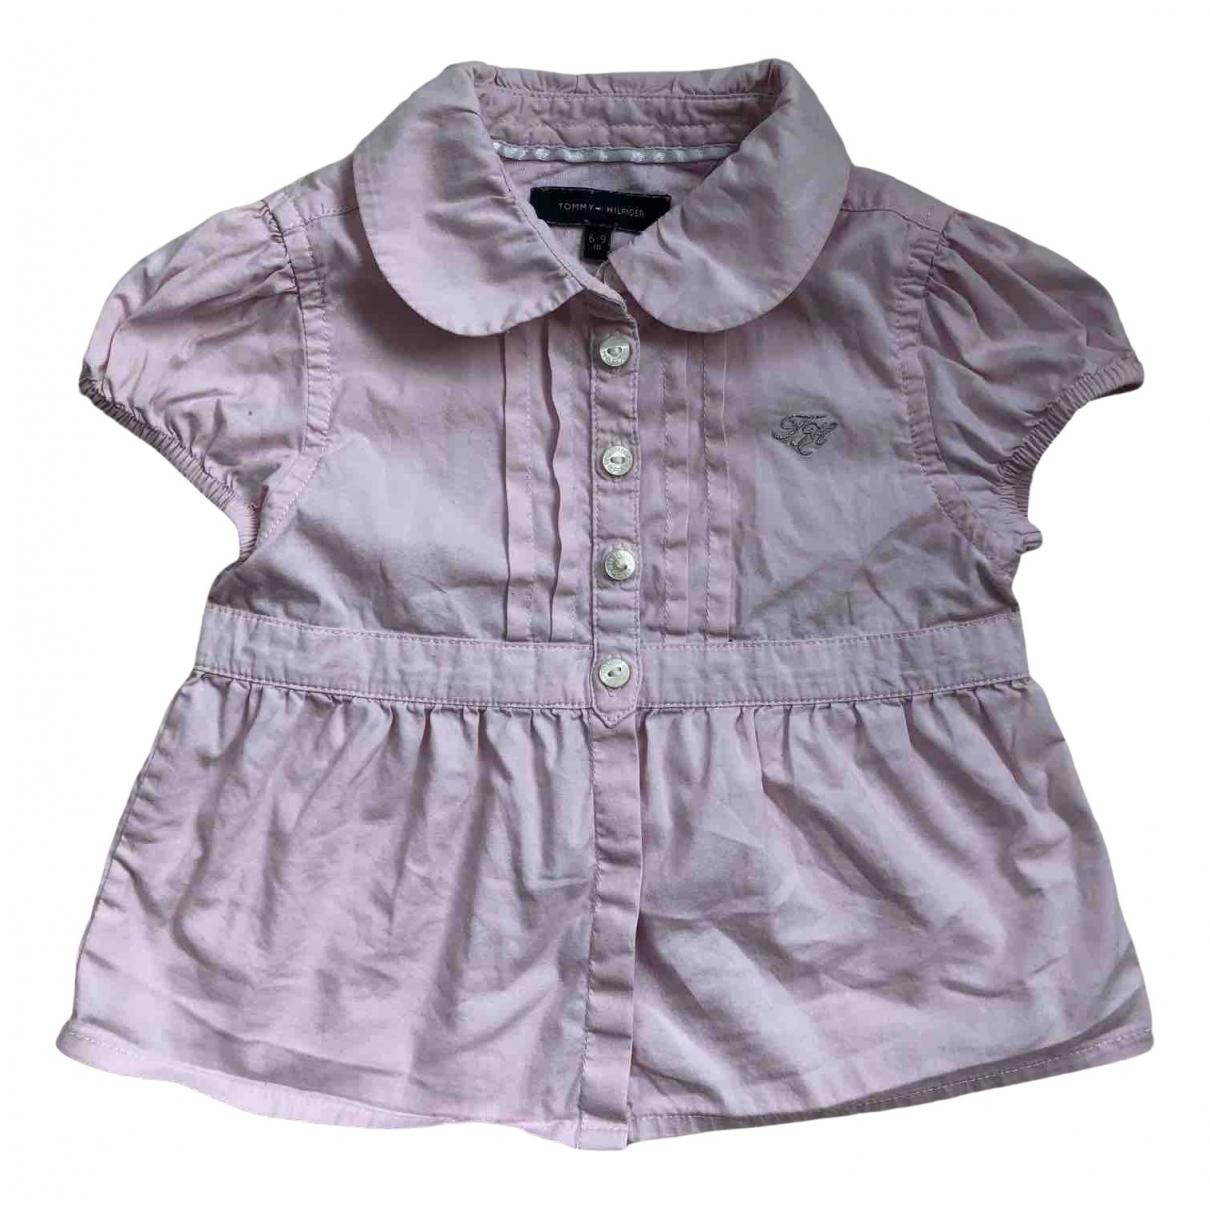 Tommy Hilfiger N Pink Cotton  top for Kids 9 months - up to 71cm FR